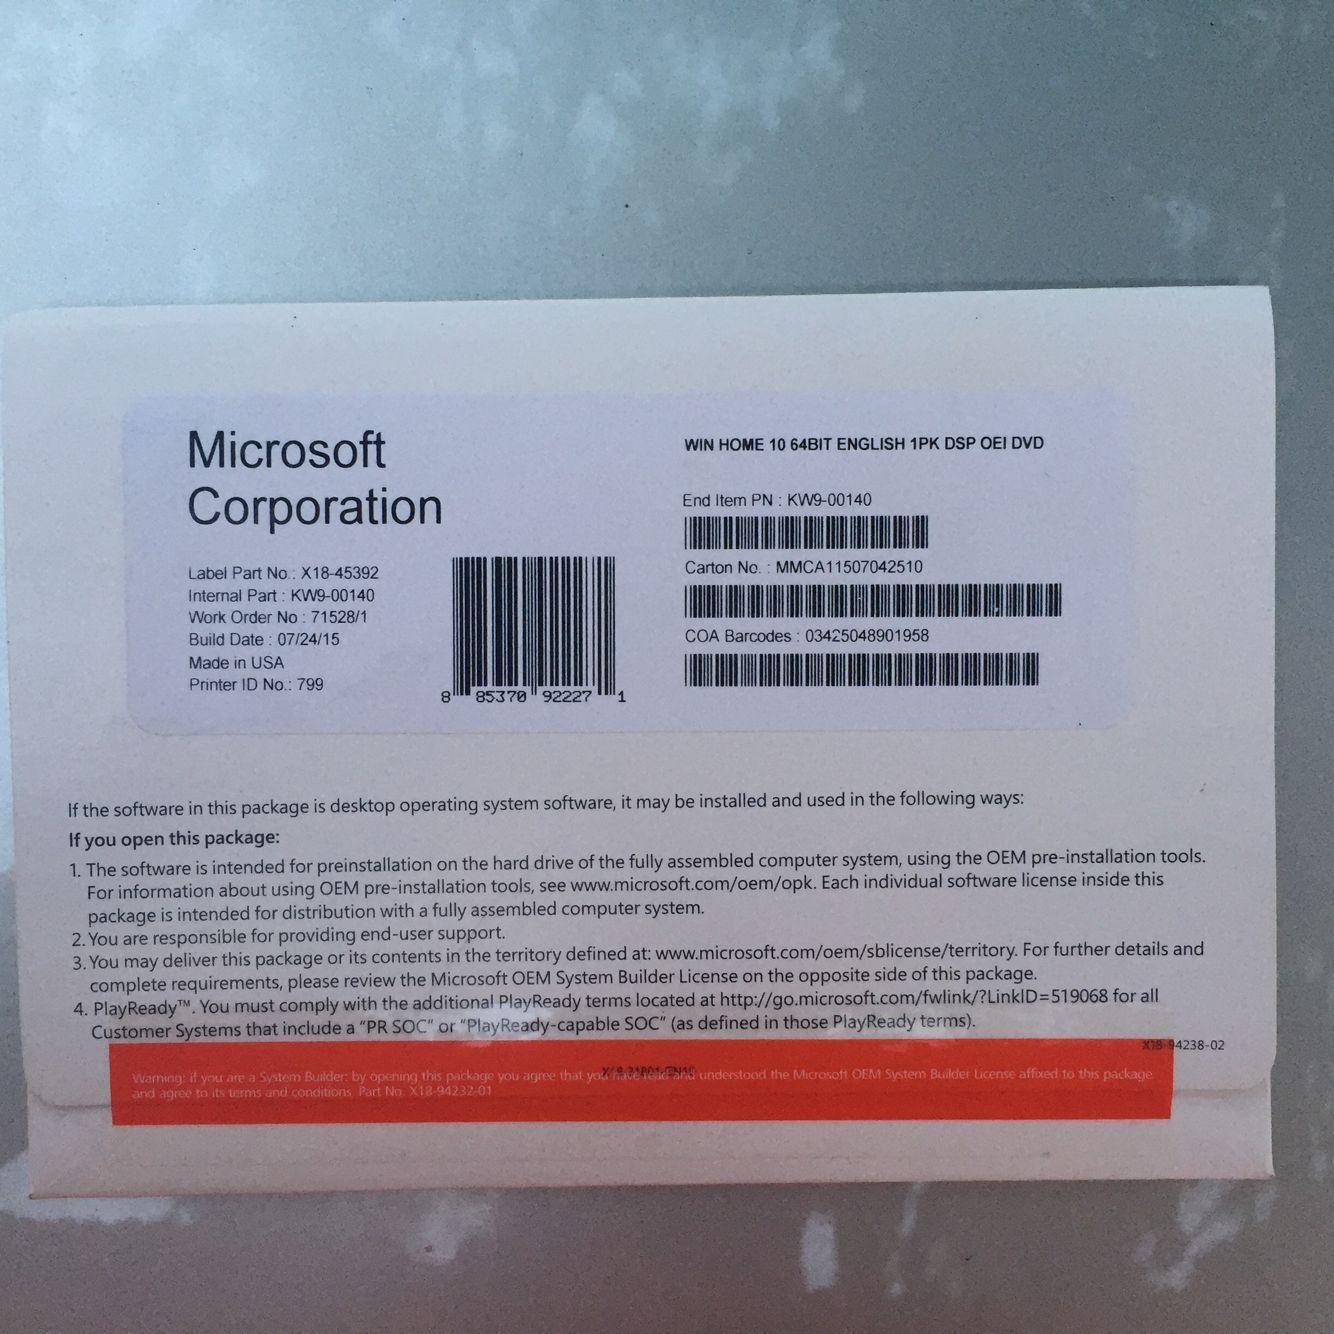 Windows 10 home key oem pack with new oem key sticker